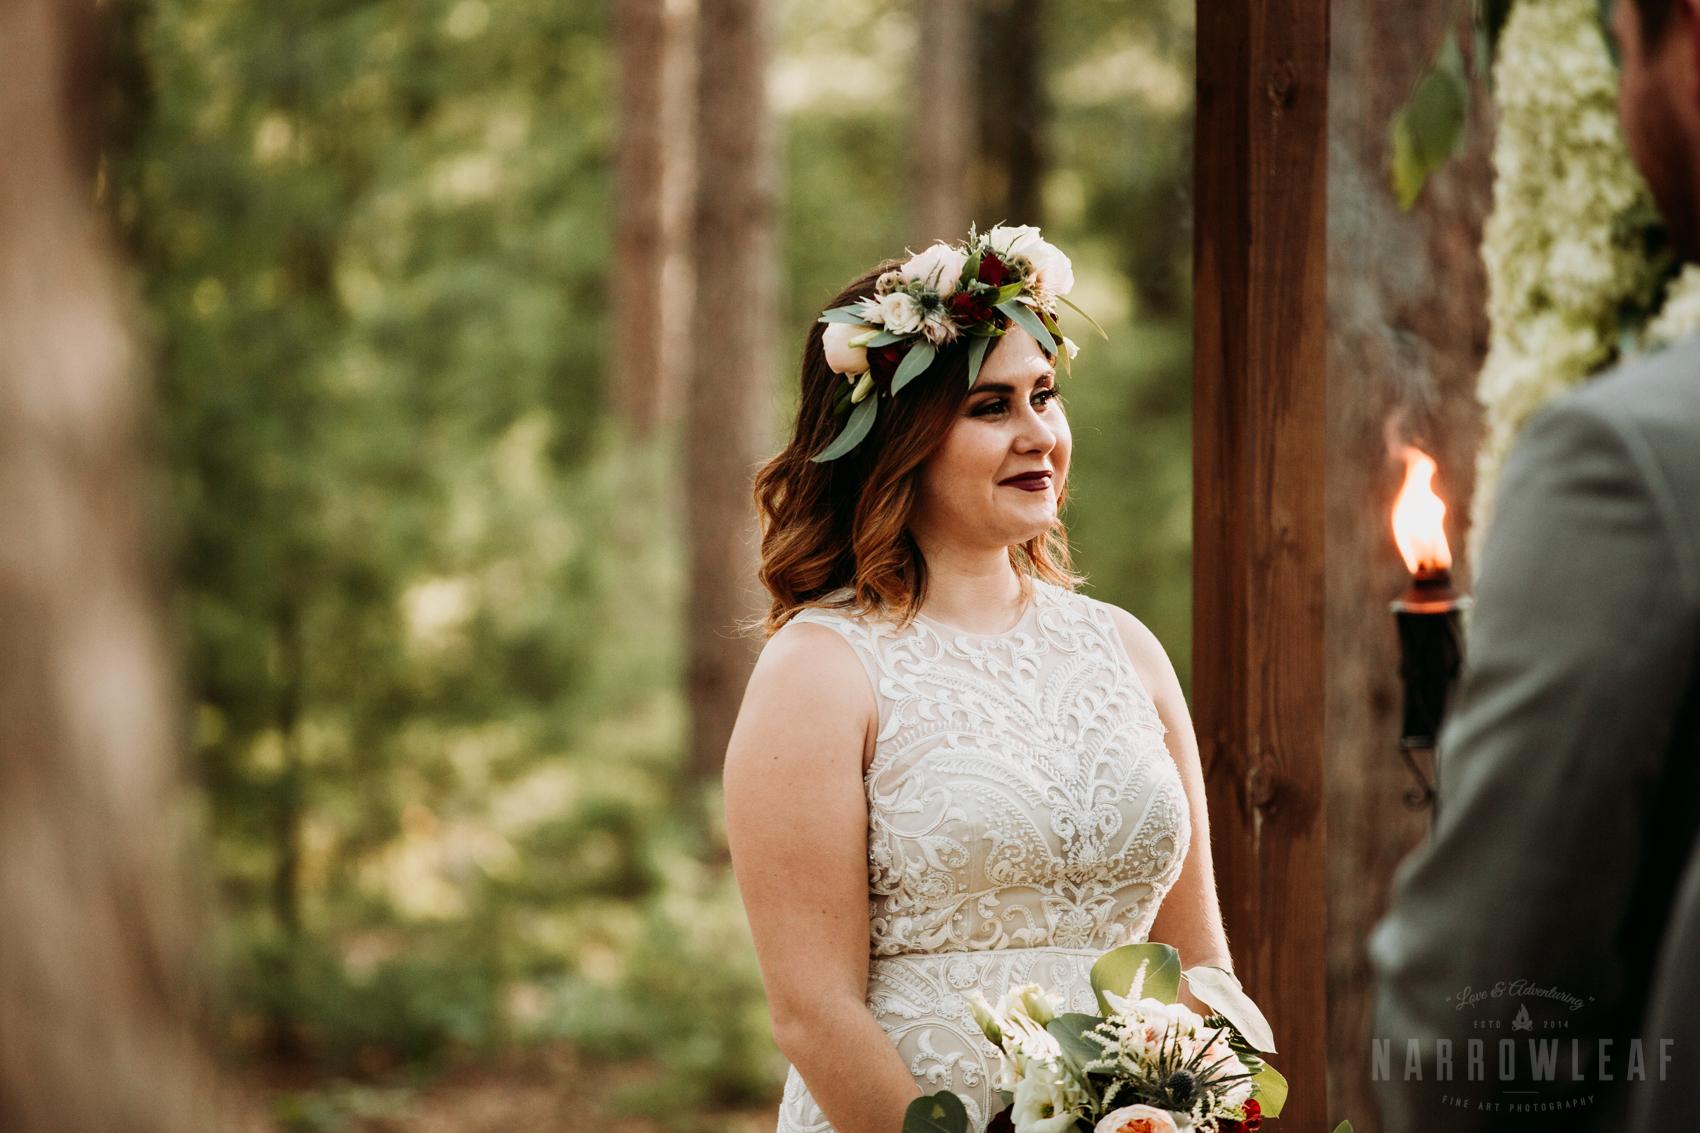 woodsy-boho-wedding-ceremony-burlap-and-bells-wi-NarrowLeaf_Love_&_Adventure_Photography-9.jpg